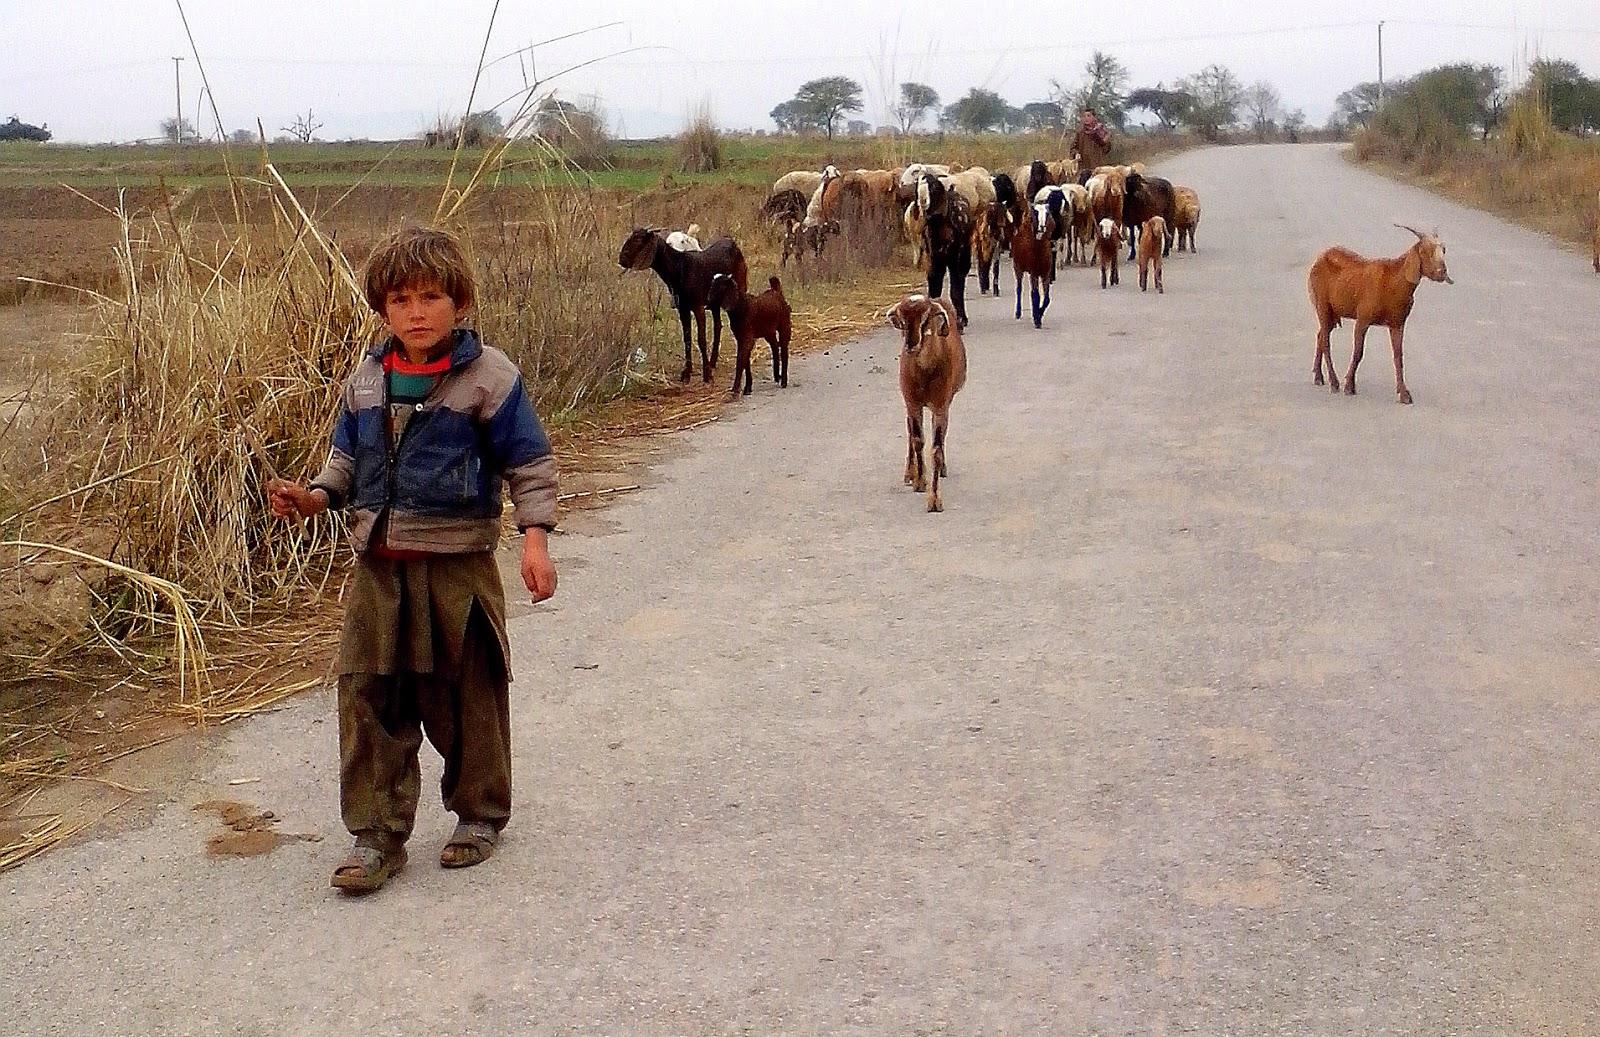 goatherd-boy-pakhtun-pakistan